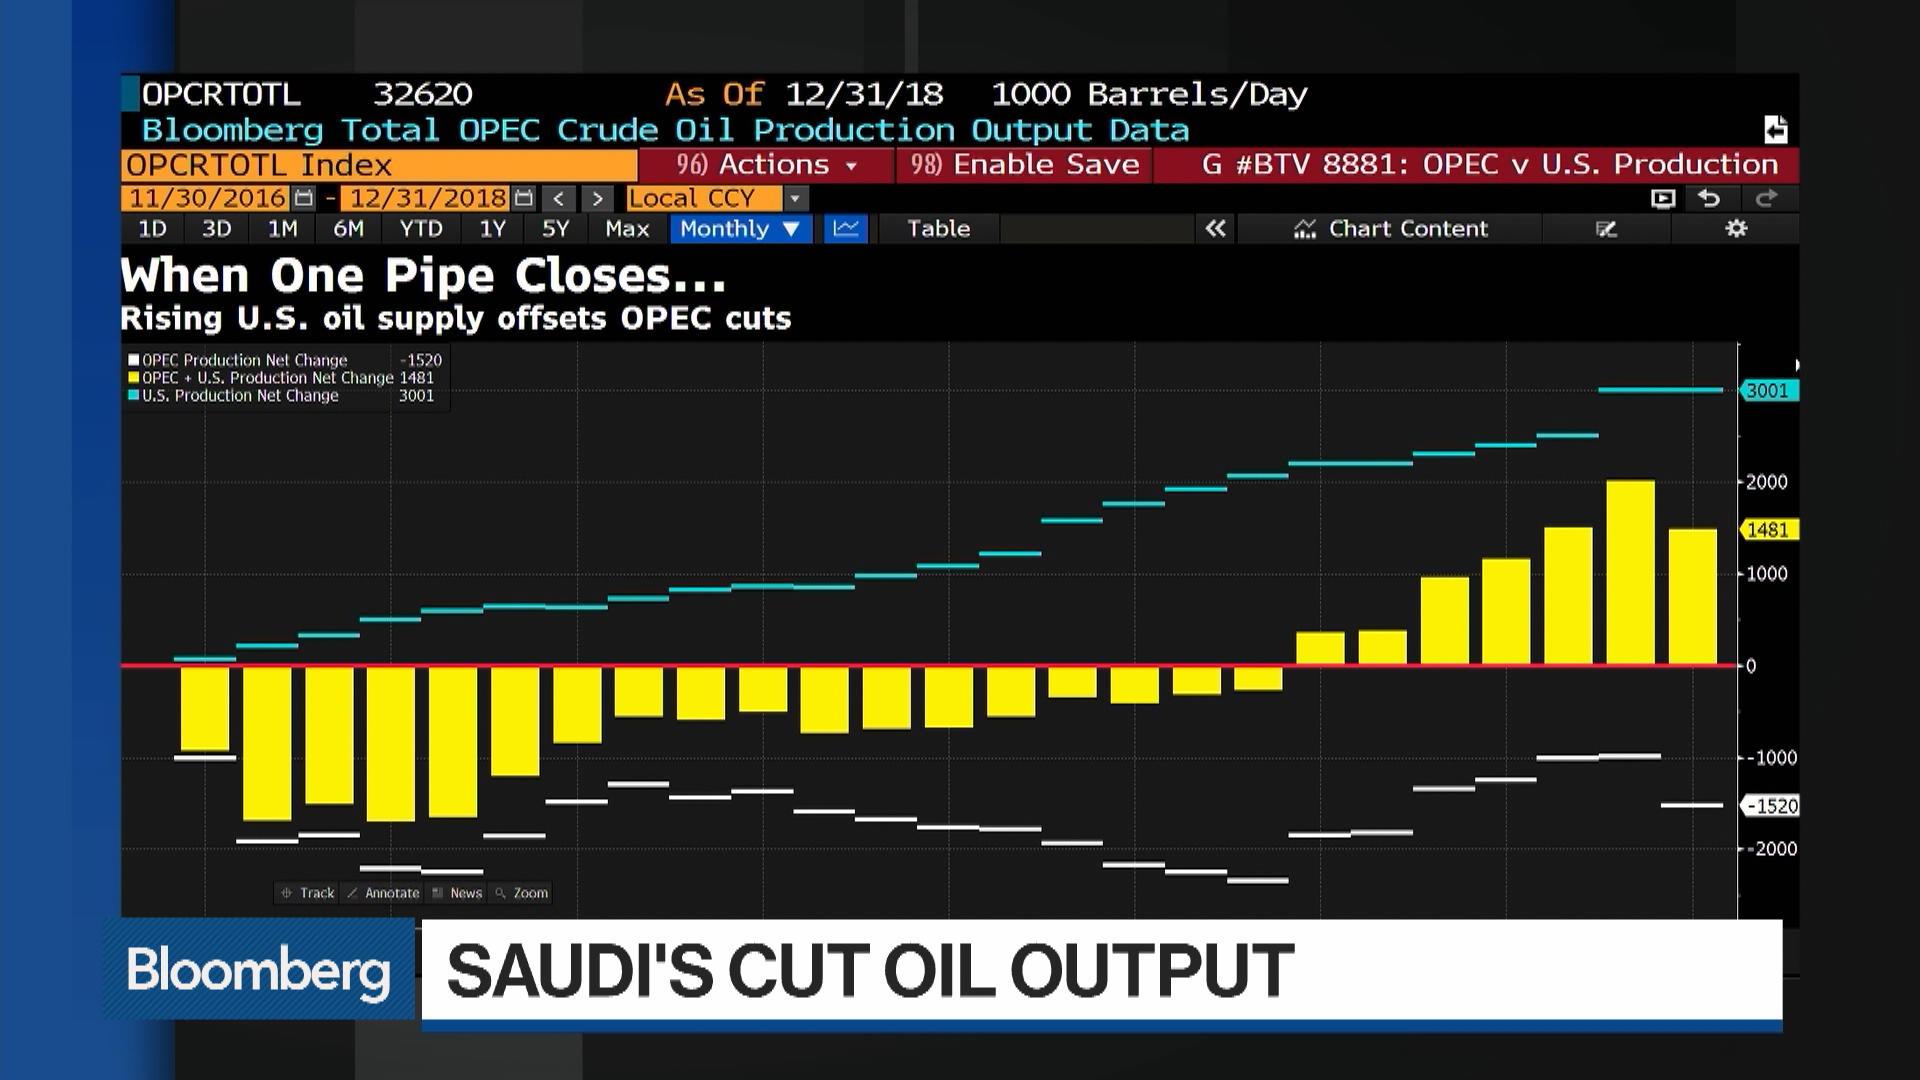 OPEC's Oil Production Falls on Saudi Cuts